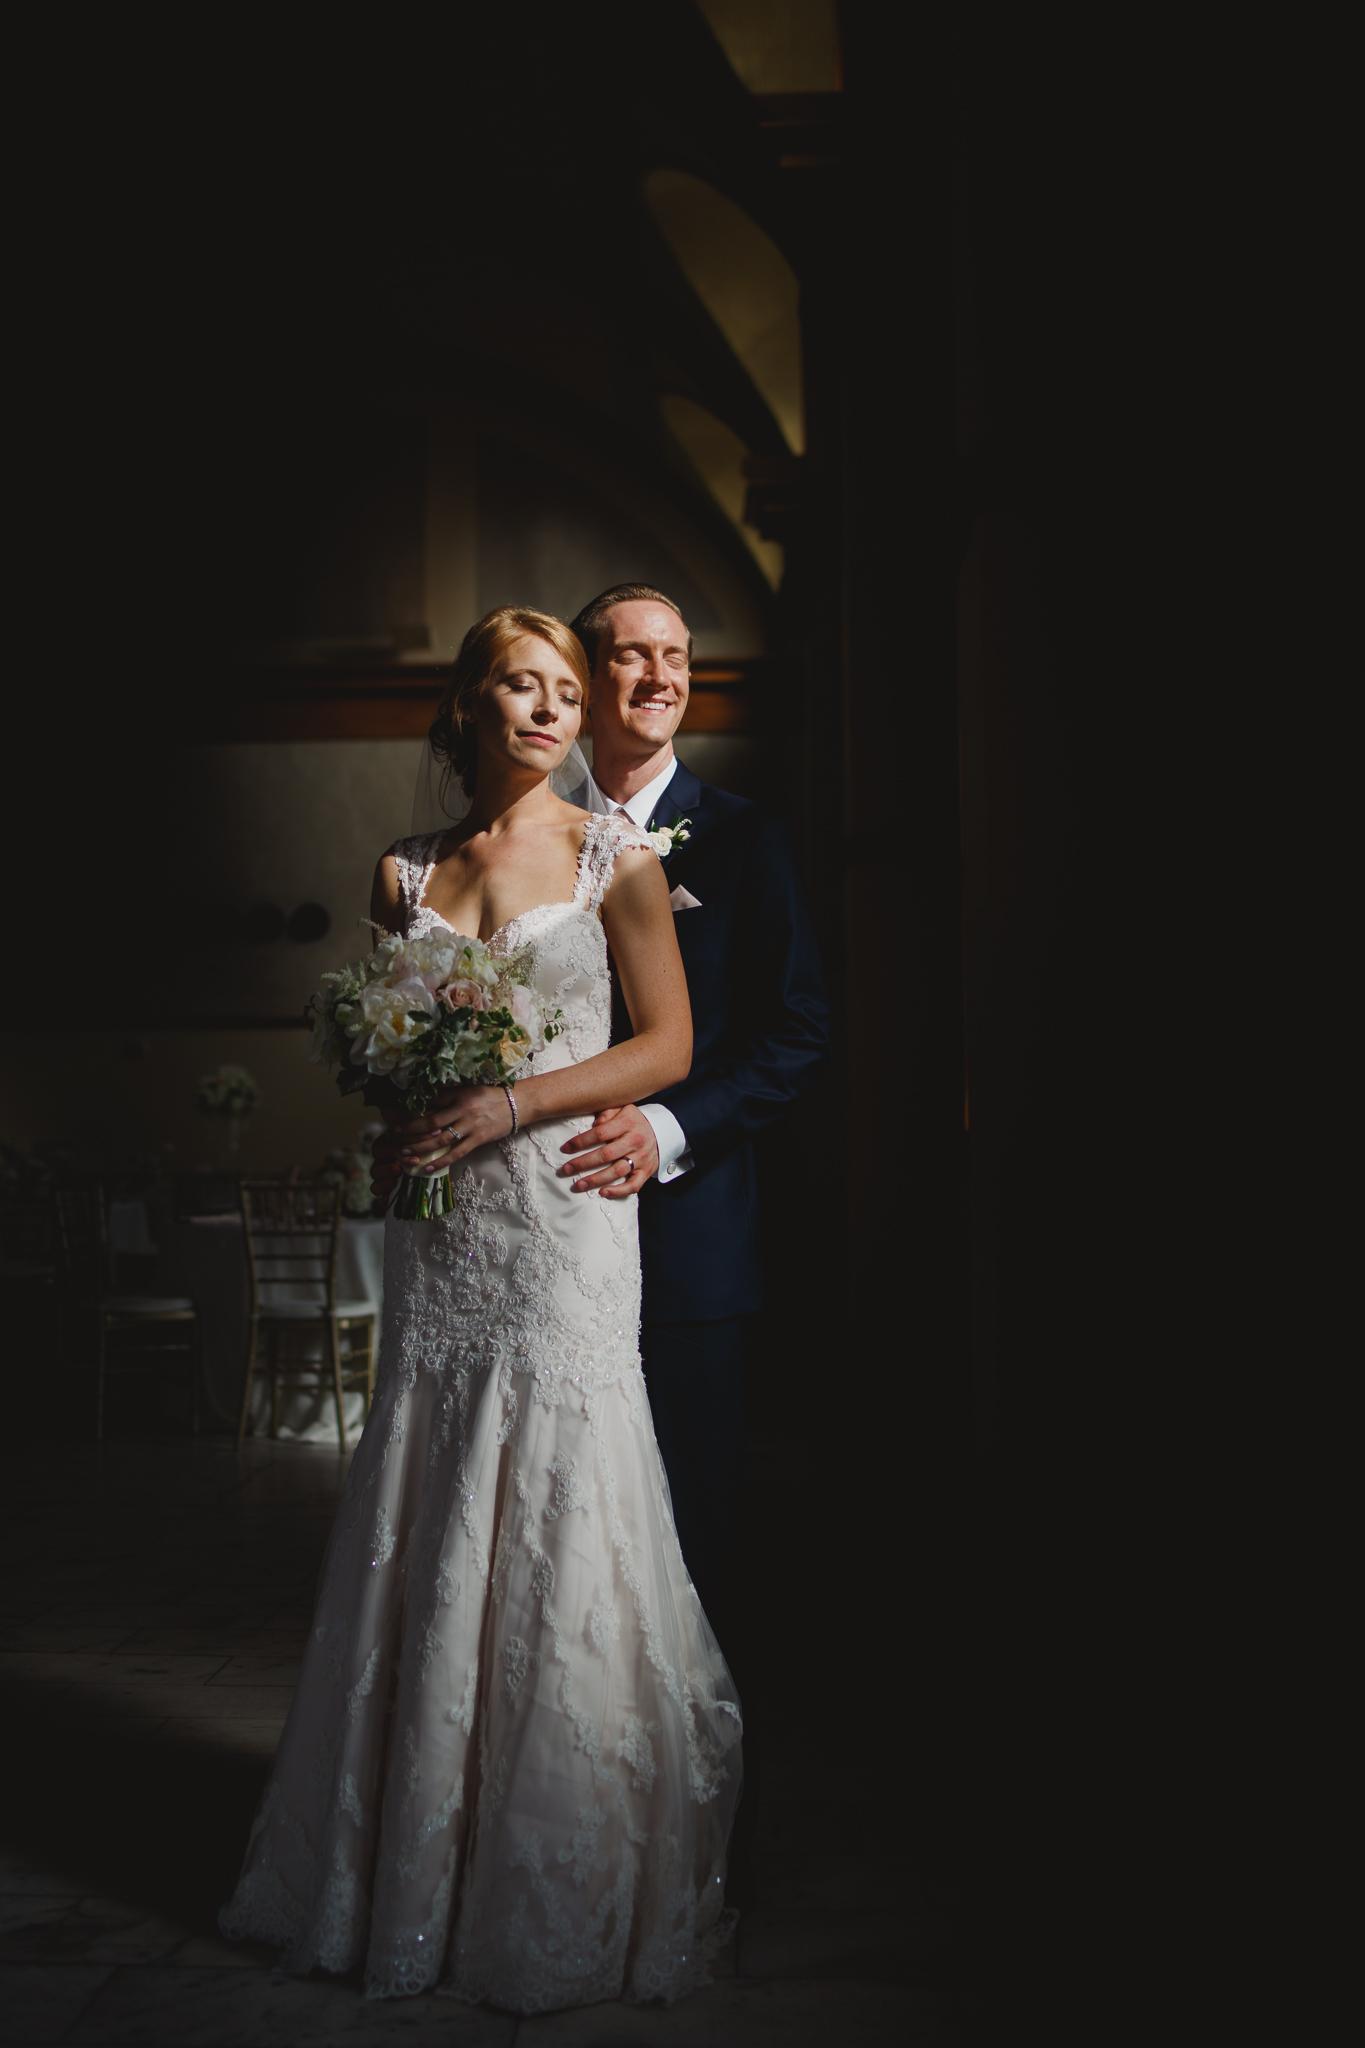 Michael and Kelly - the ashton depot - wedding DFW - wedding photographer- elizalde photography (63 of 150).jpg